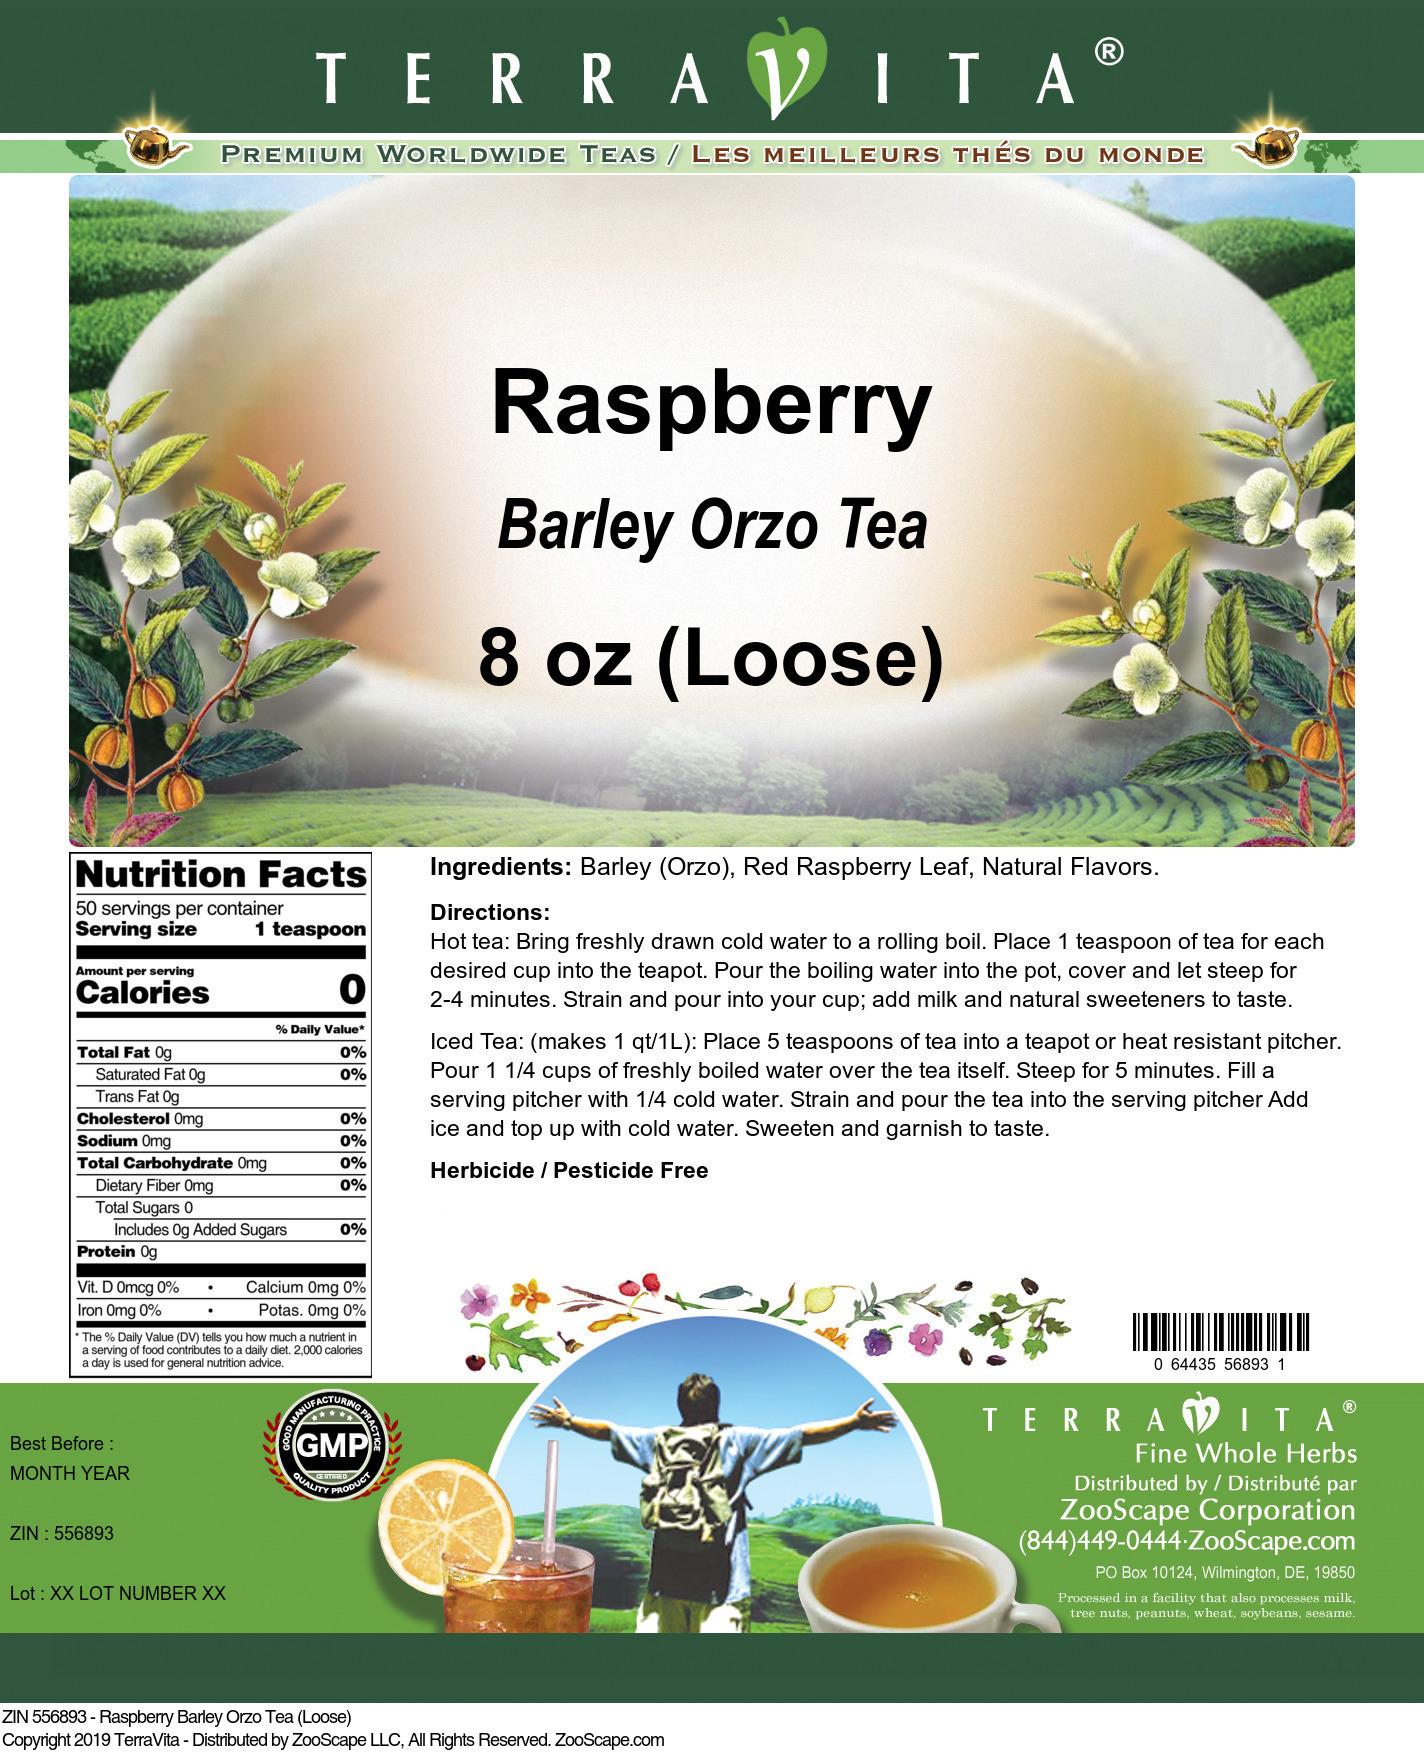 Raspberry Barley Orzo Tea (Loose)